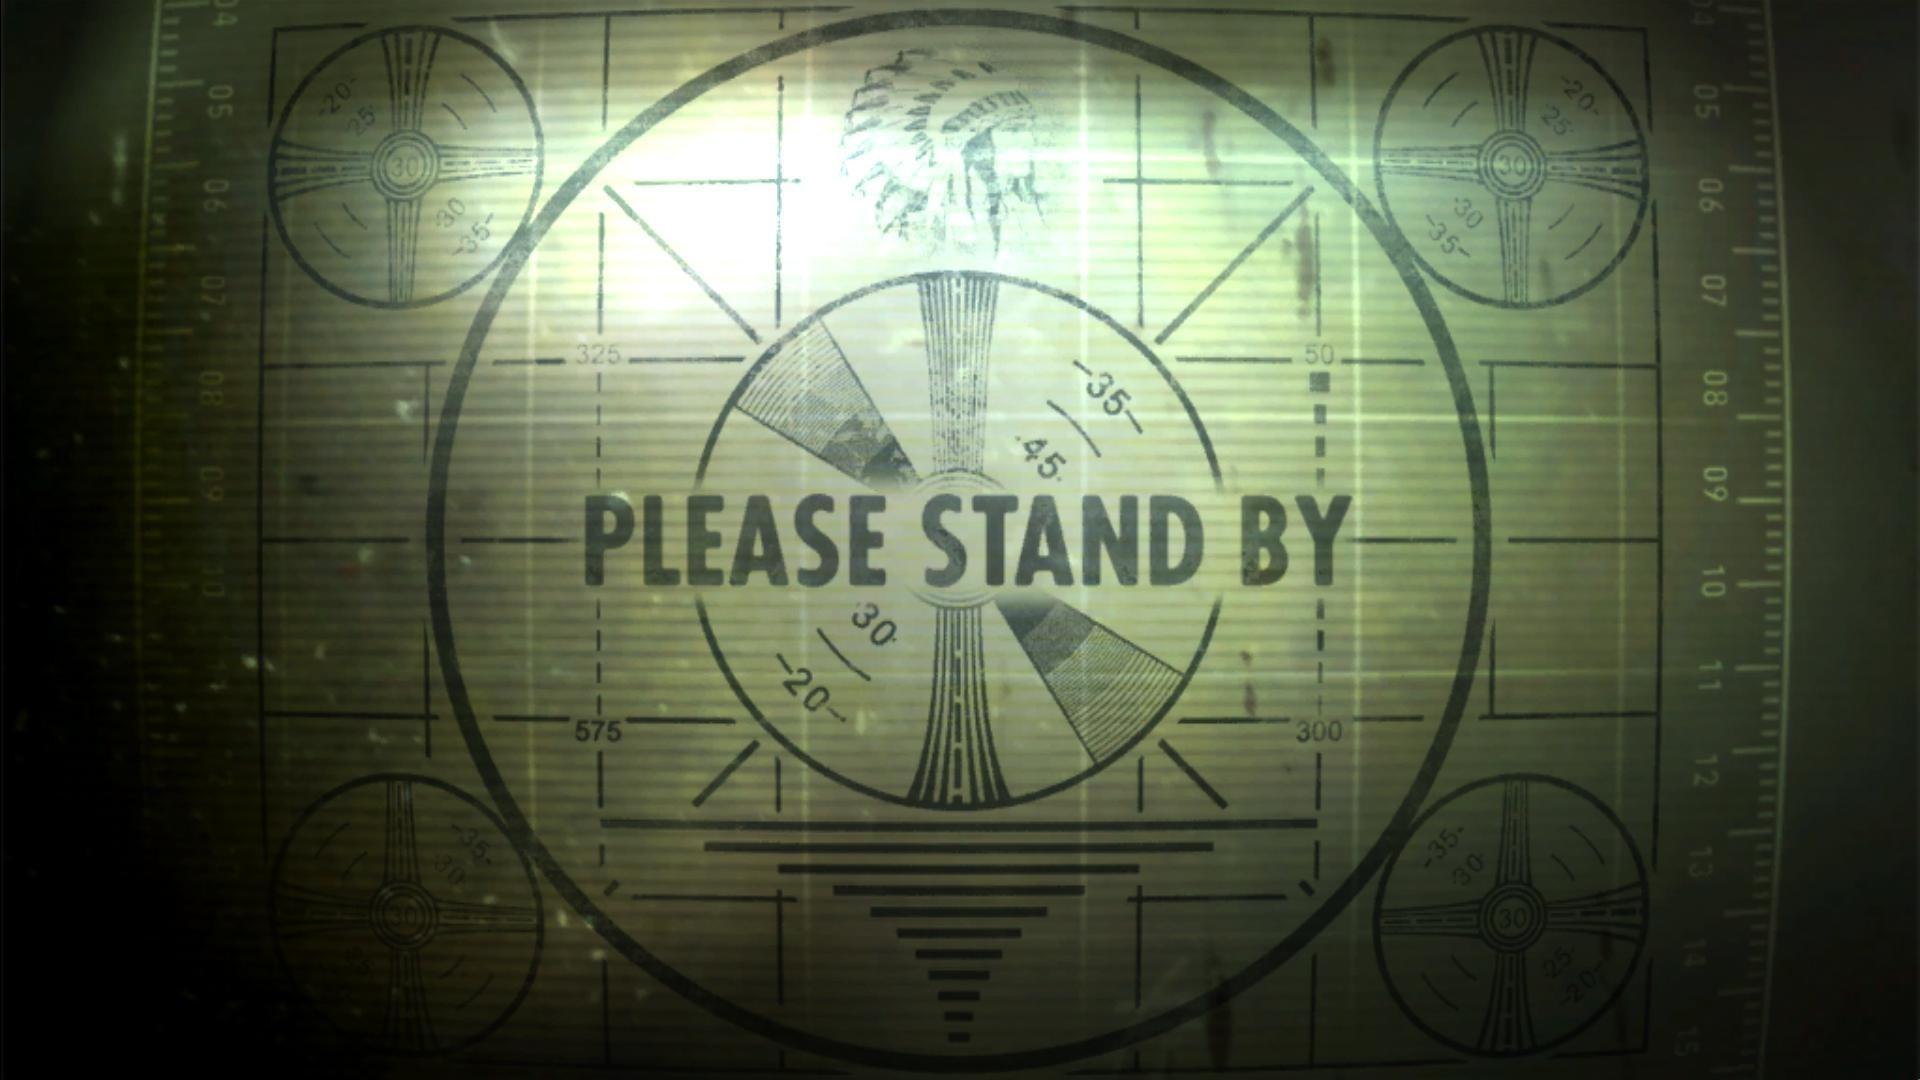 Fallout 4 Background Fallout 4 Concept Art Wallpaper